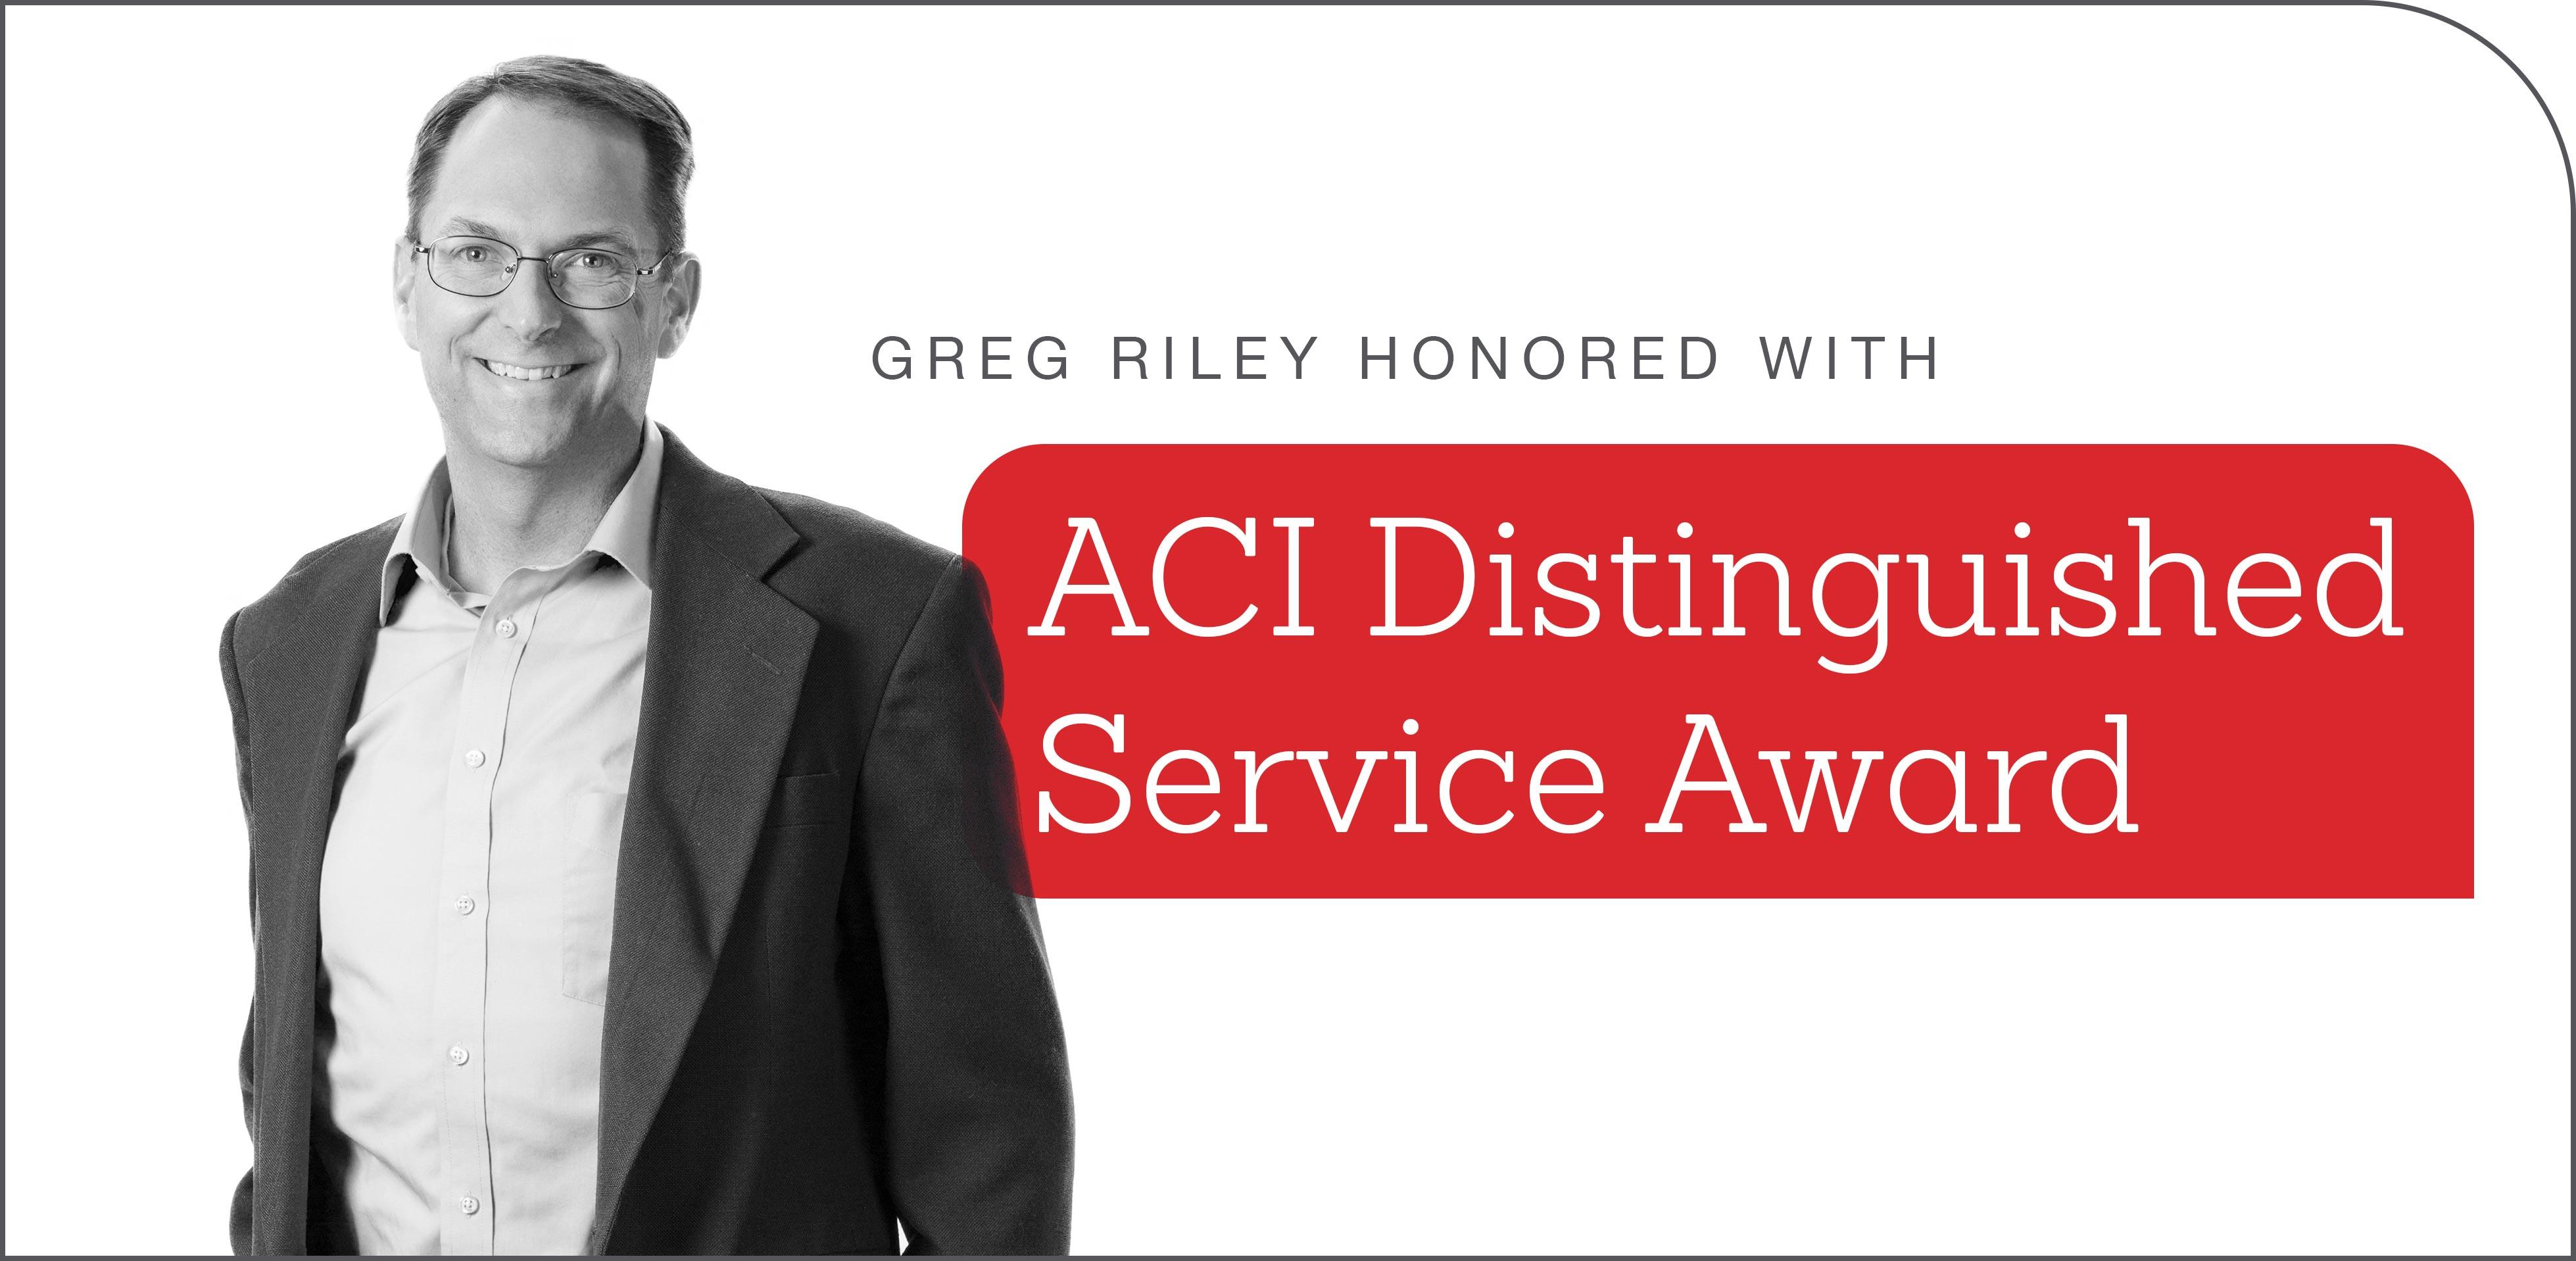 Greg Riley Wins ACI Distinguished Service Award